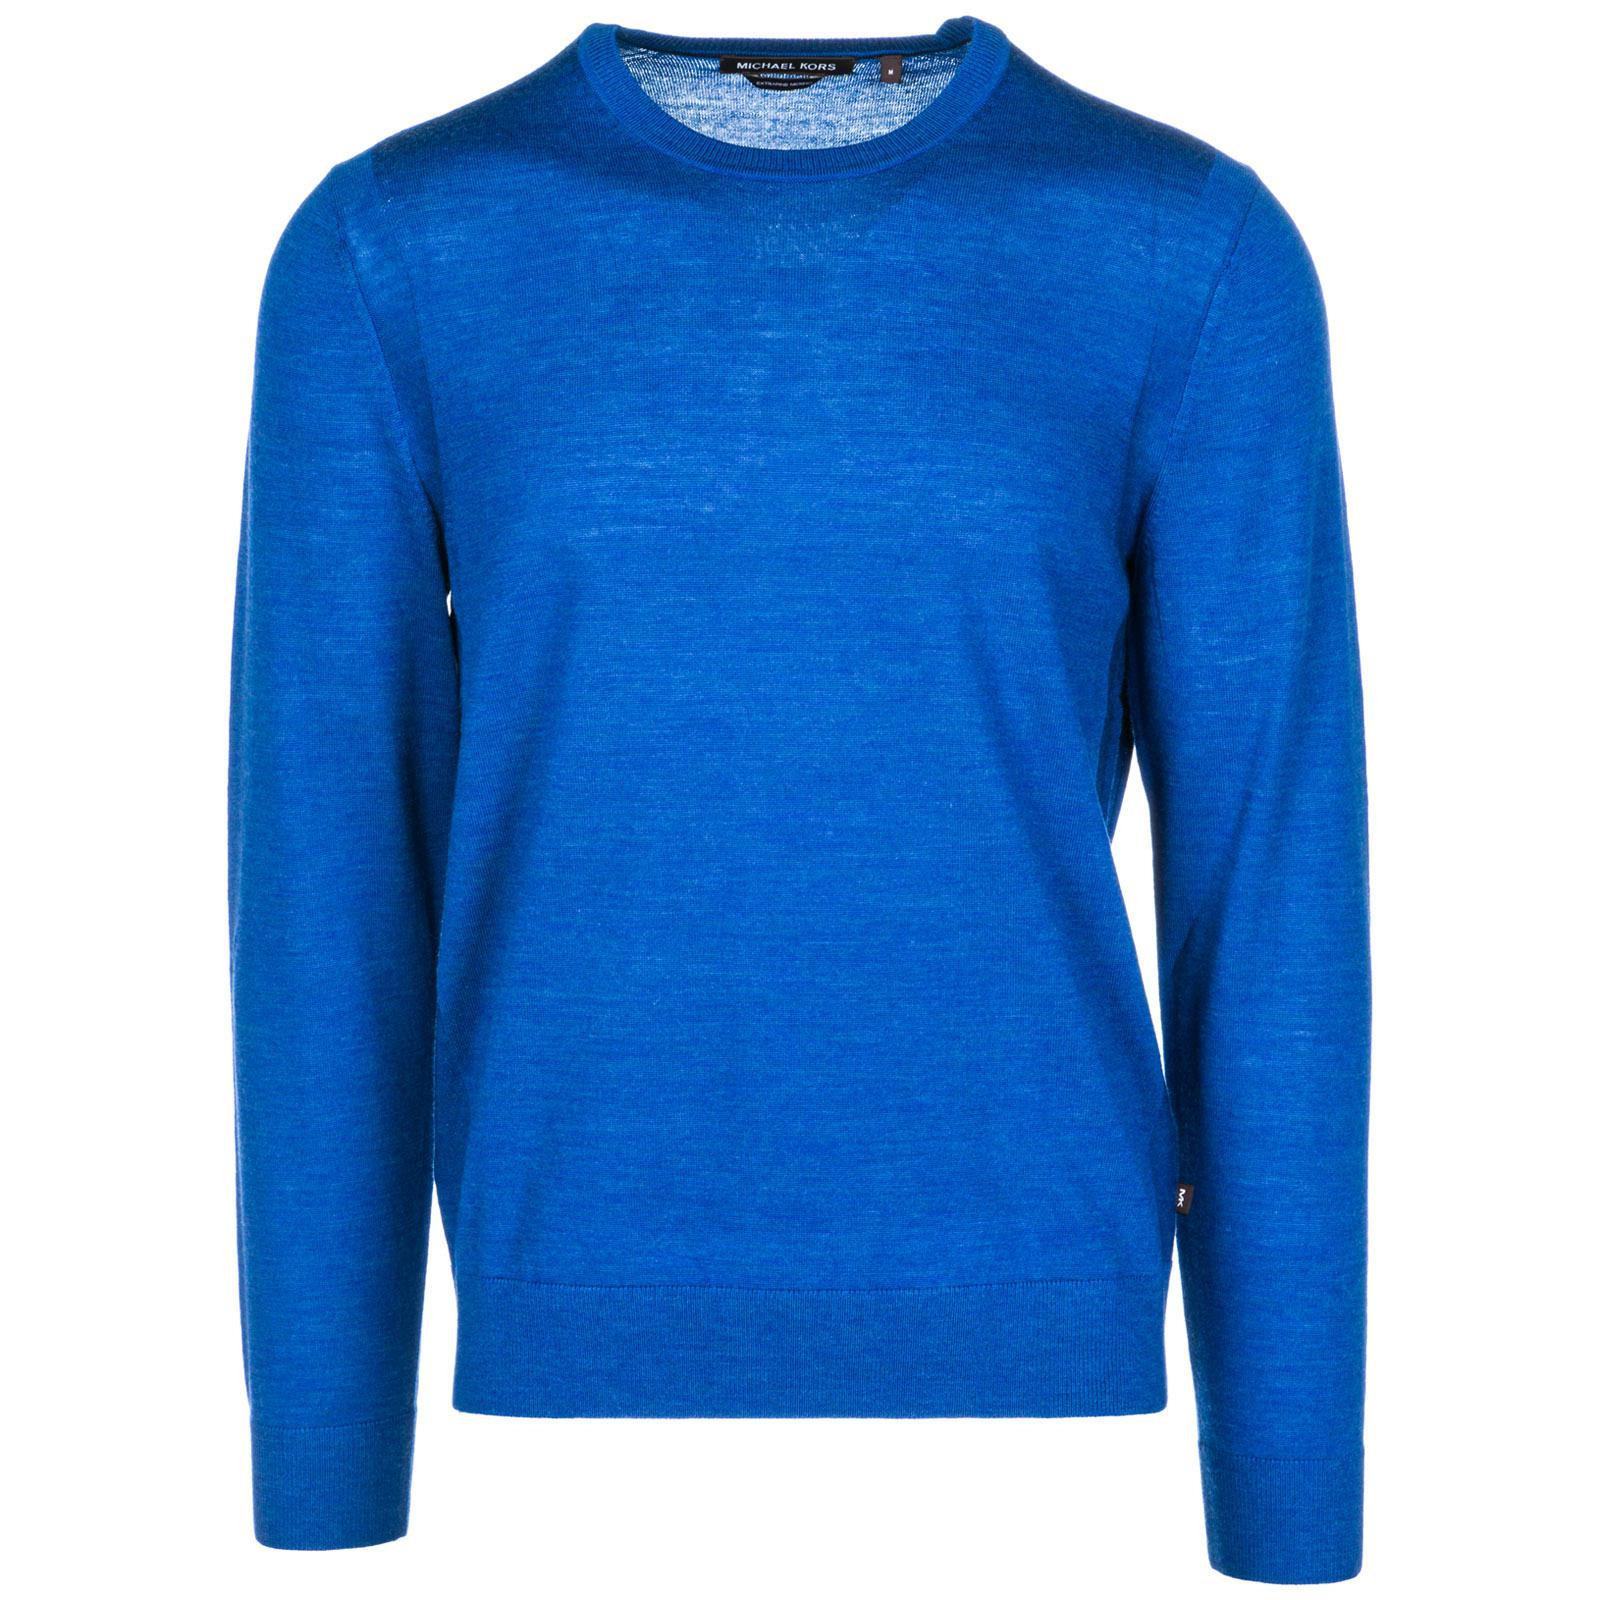 Michael Kors Men's Crew Neck Neckline Jumper Sweater Pullover In Blue